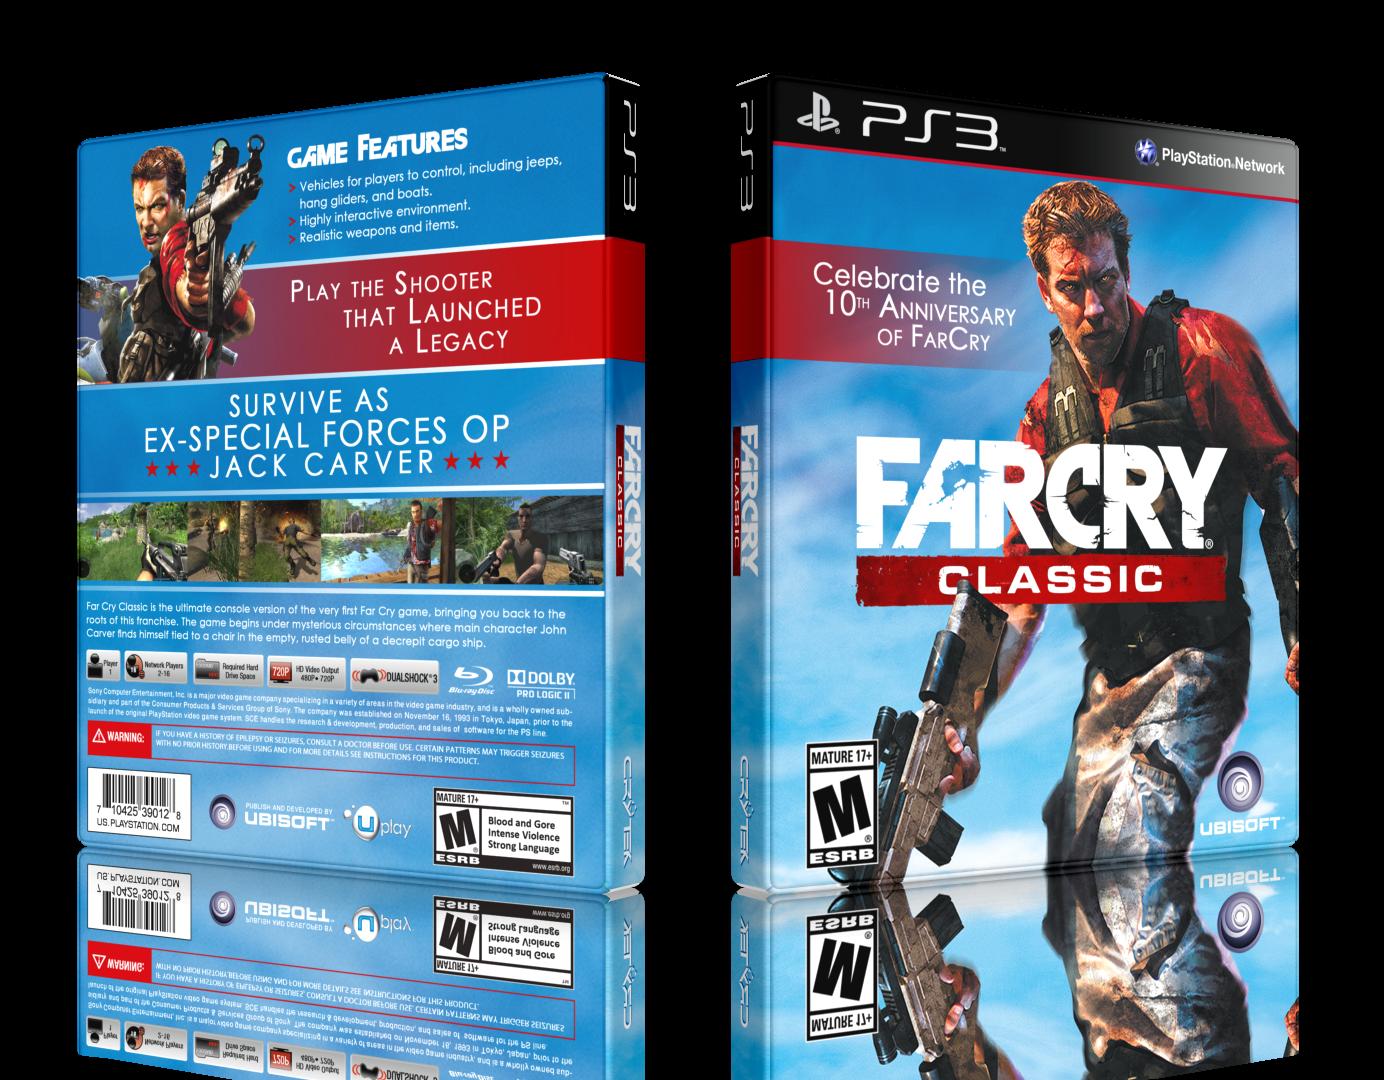 Far Cry Classic Playstation 3 Box Art Cover By Lastlight